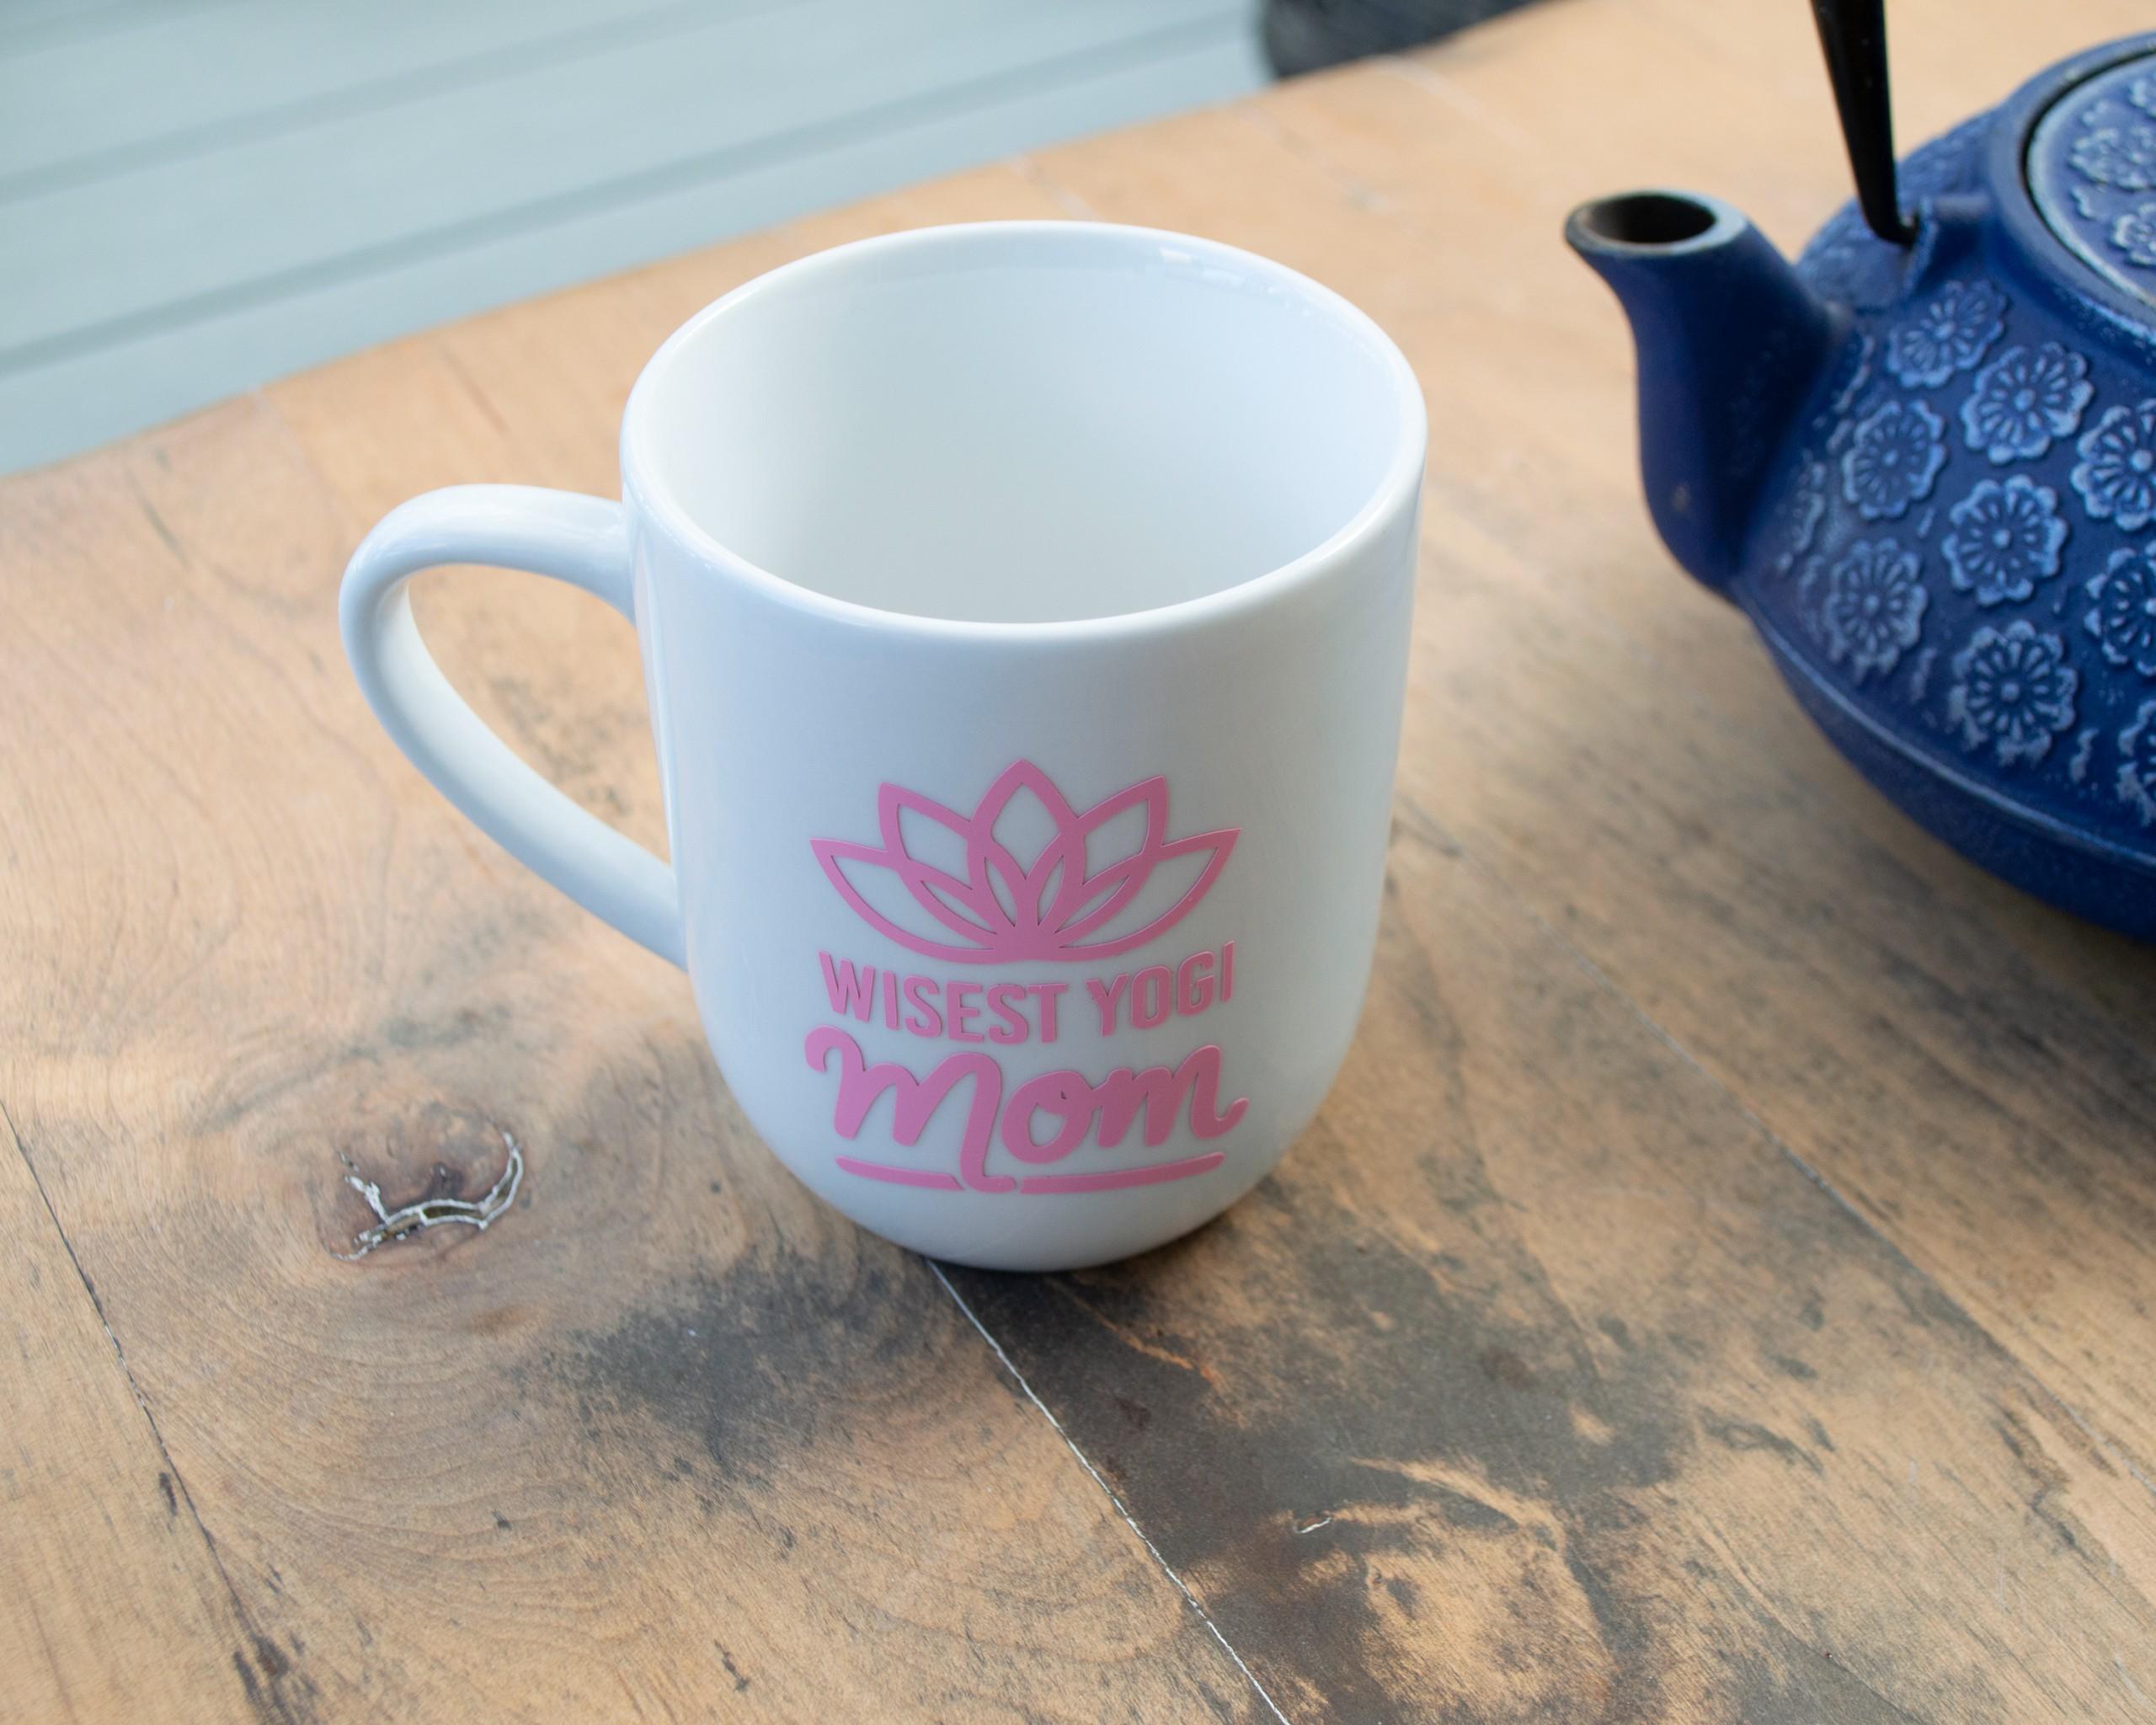 Wisest Yogi Mom Ceramic Mug